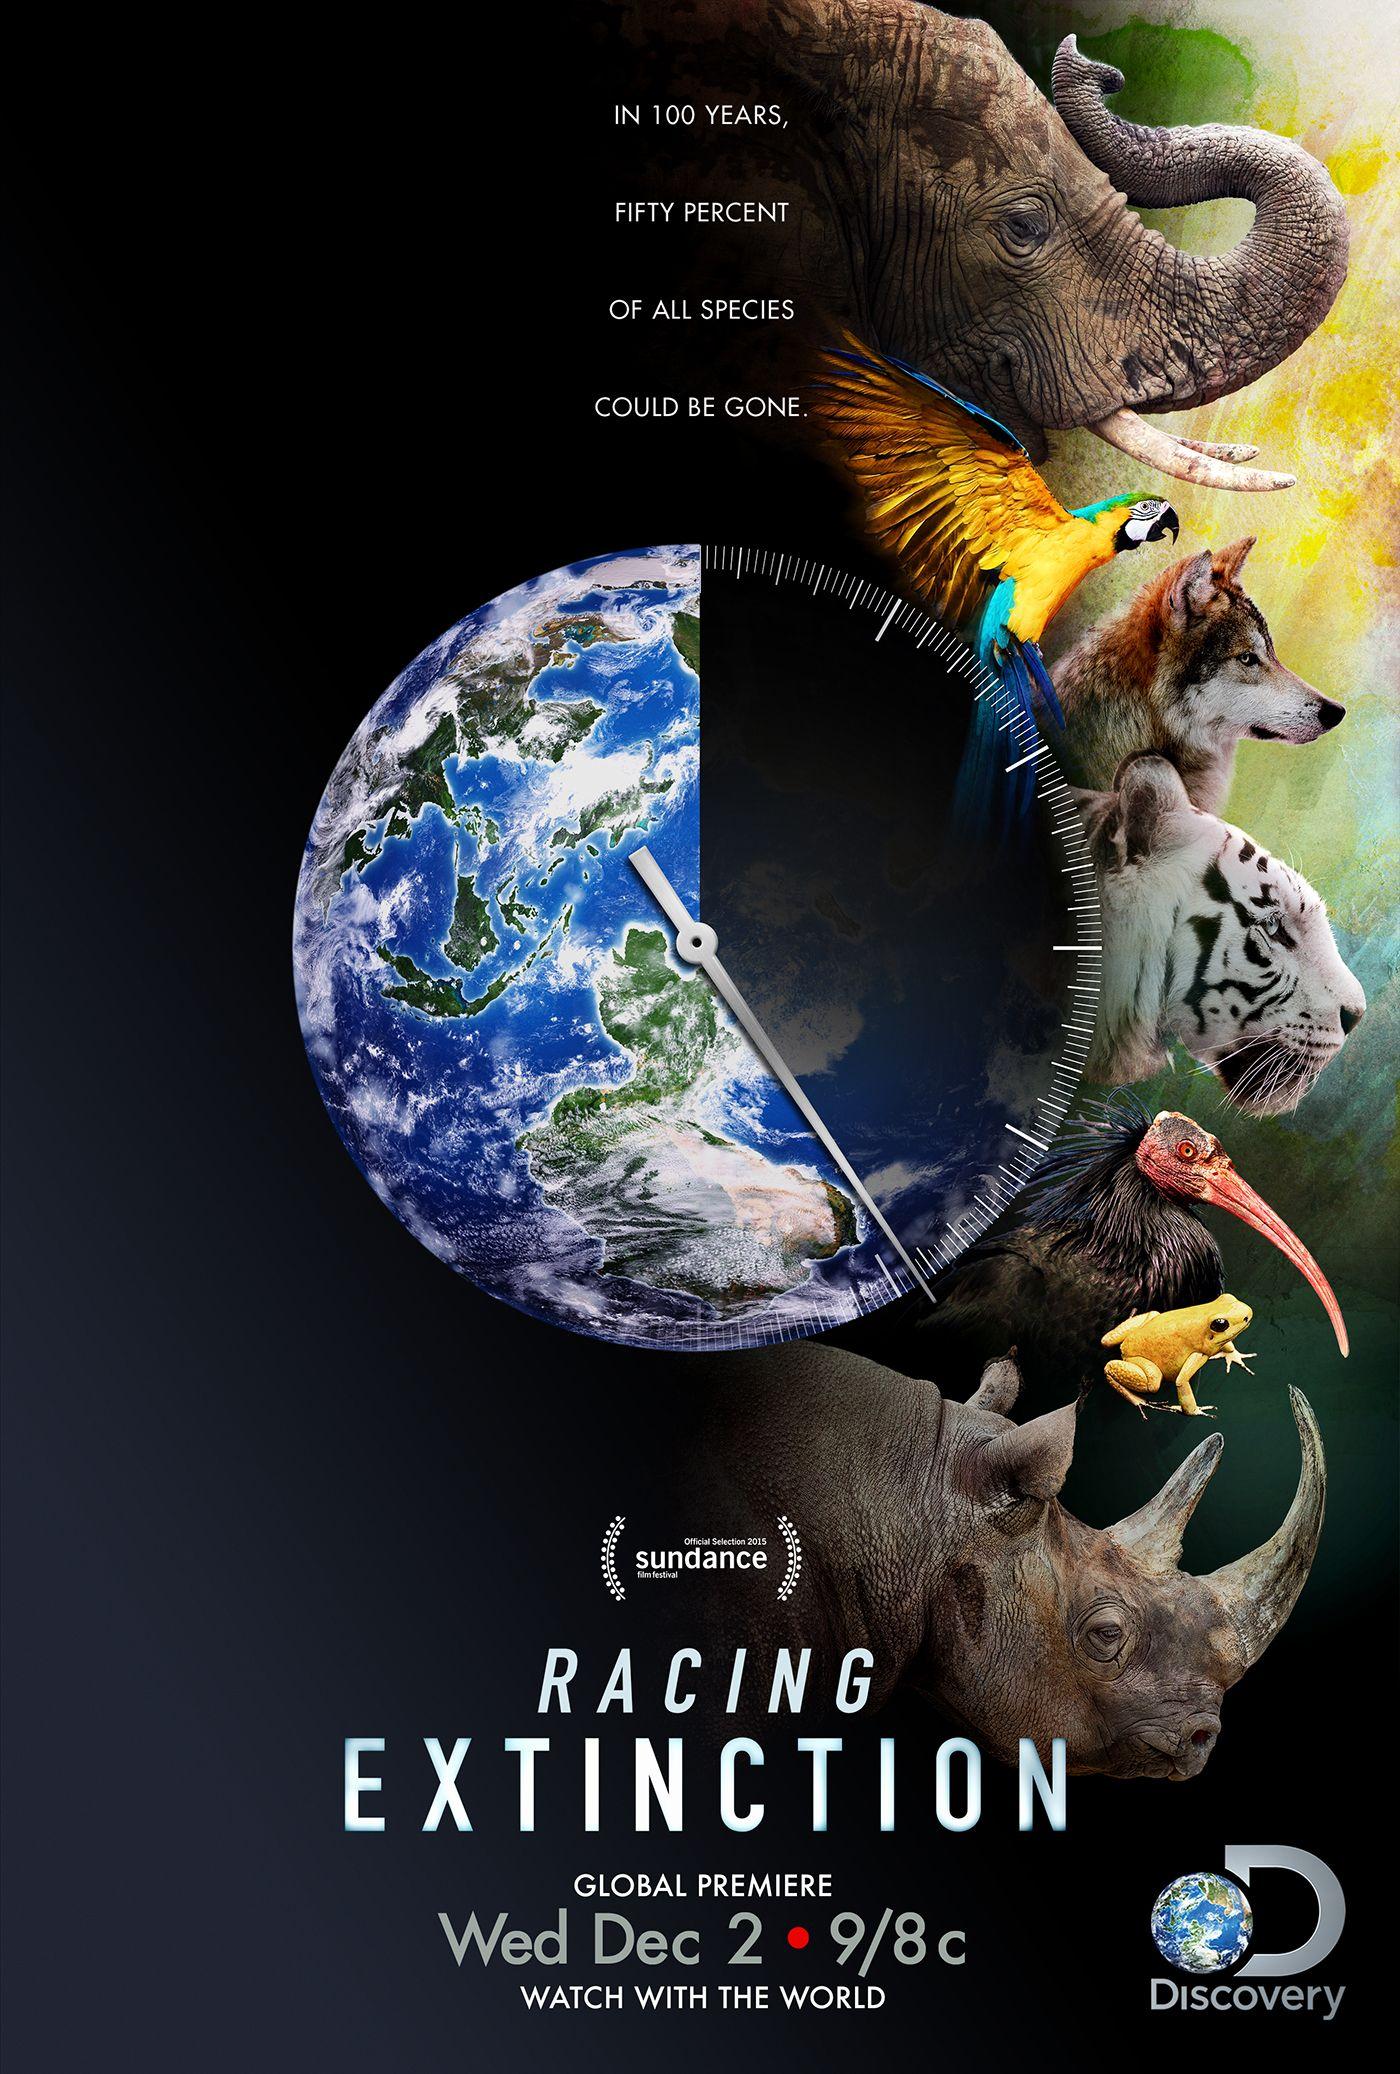 Best 25+ Racing extinction ideas on Pinterest | Extinction ... - photo#13